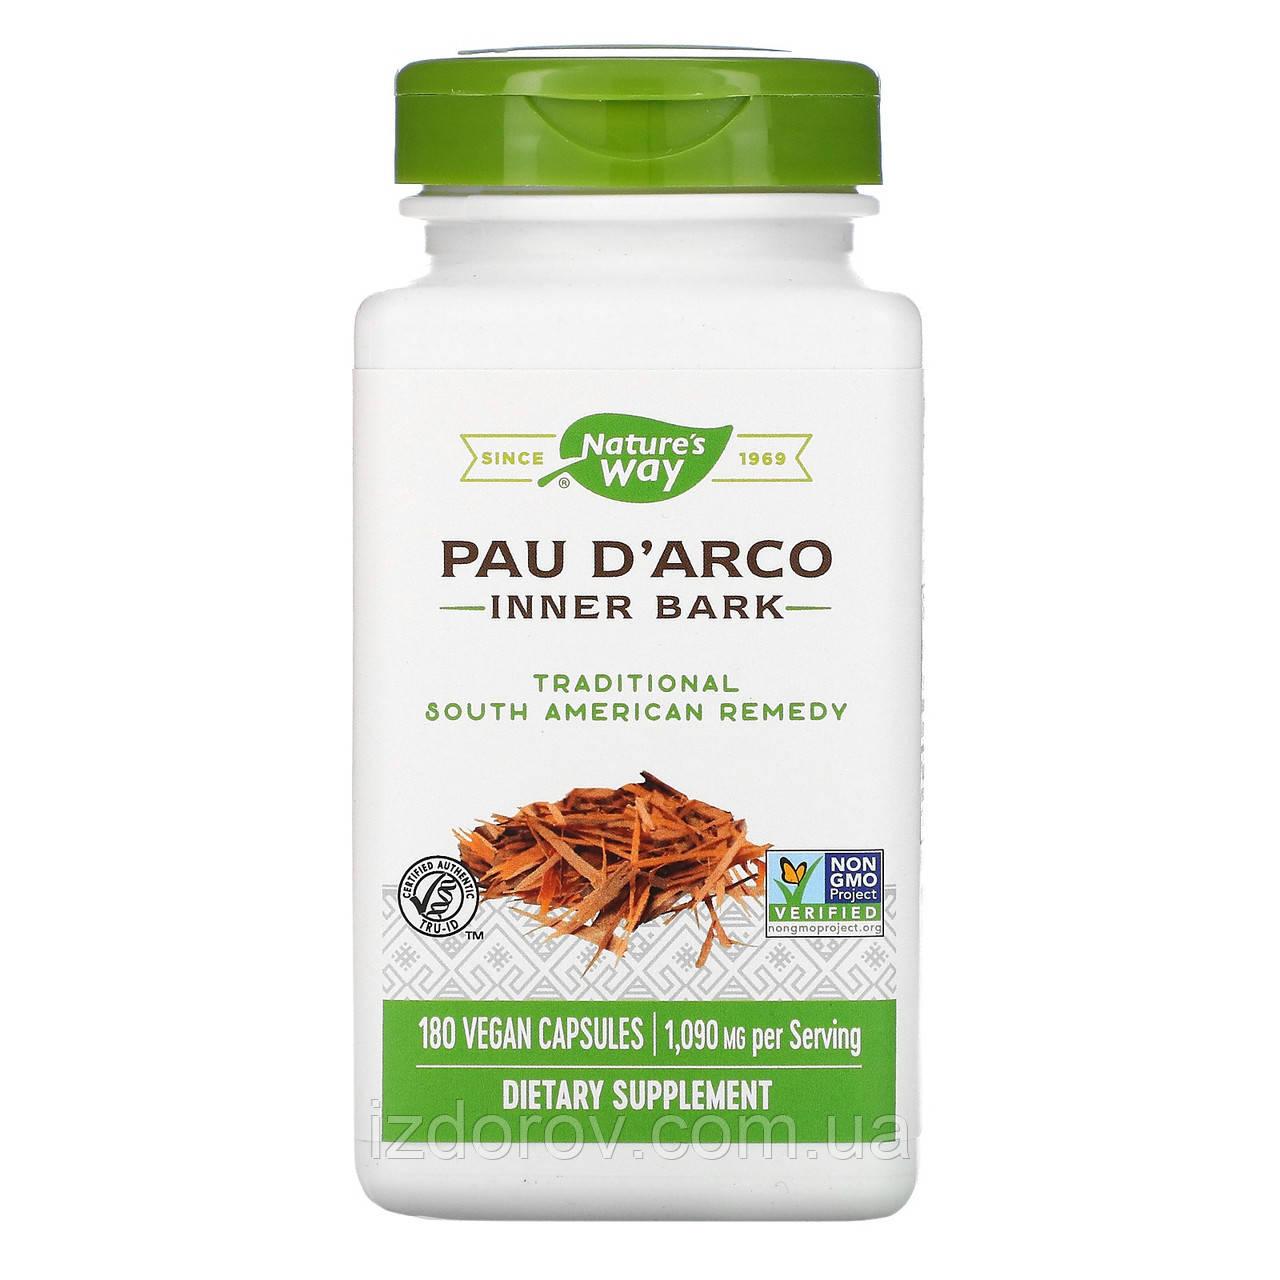 Nature's Way, Кора муравьиного дерева Pau D'Arco, Пау Д'Арко, 1090 мг (порция на 2 капсулы), 180 капсул